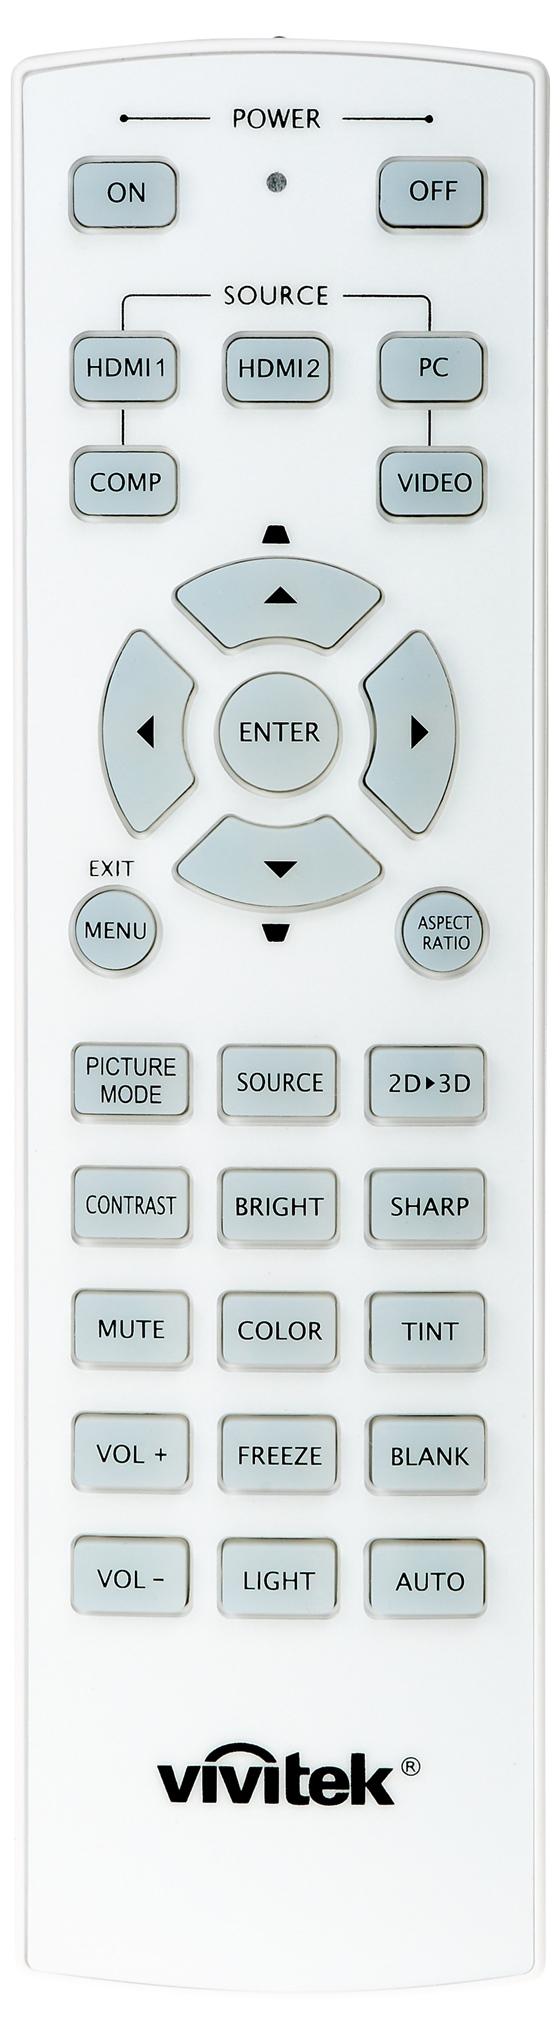 01112 Vivitek remote 002